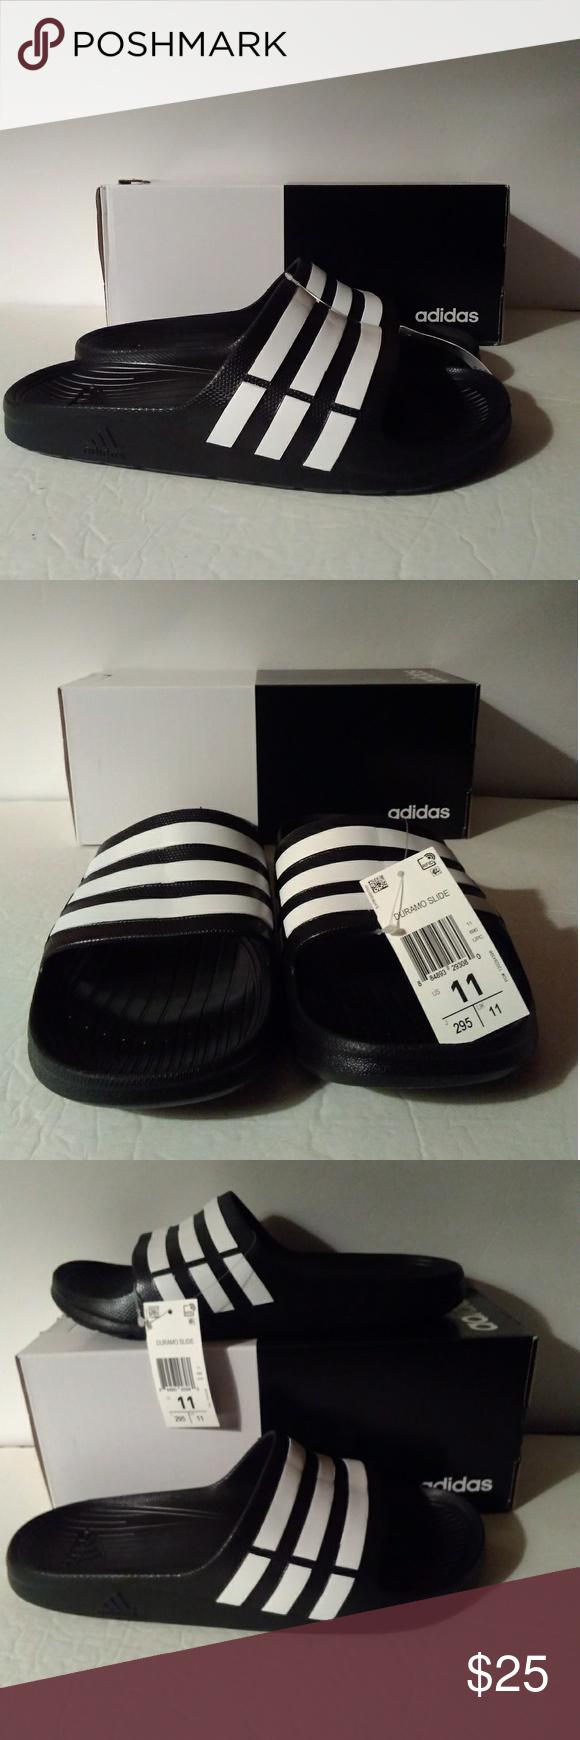 the latest 421c9 309ac Adidas Duramo Slide Sandals - BlackWhite Men 11 Adidas Duramo Slide Sandals  - BlackWhite Shower Sandals Men Size 11 adidas Shoes Sandals  Flip-Flops